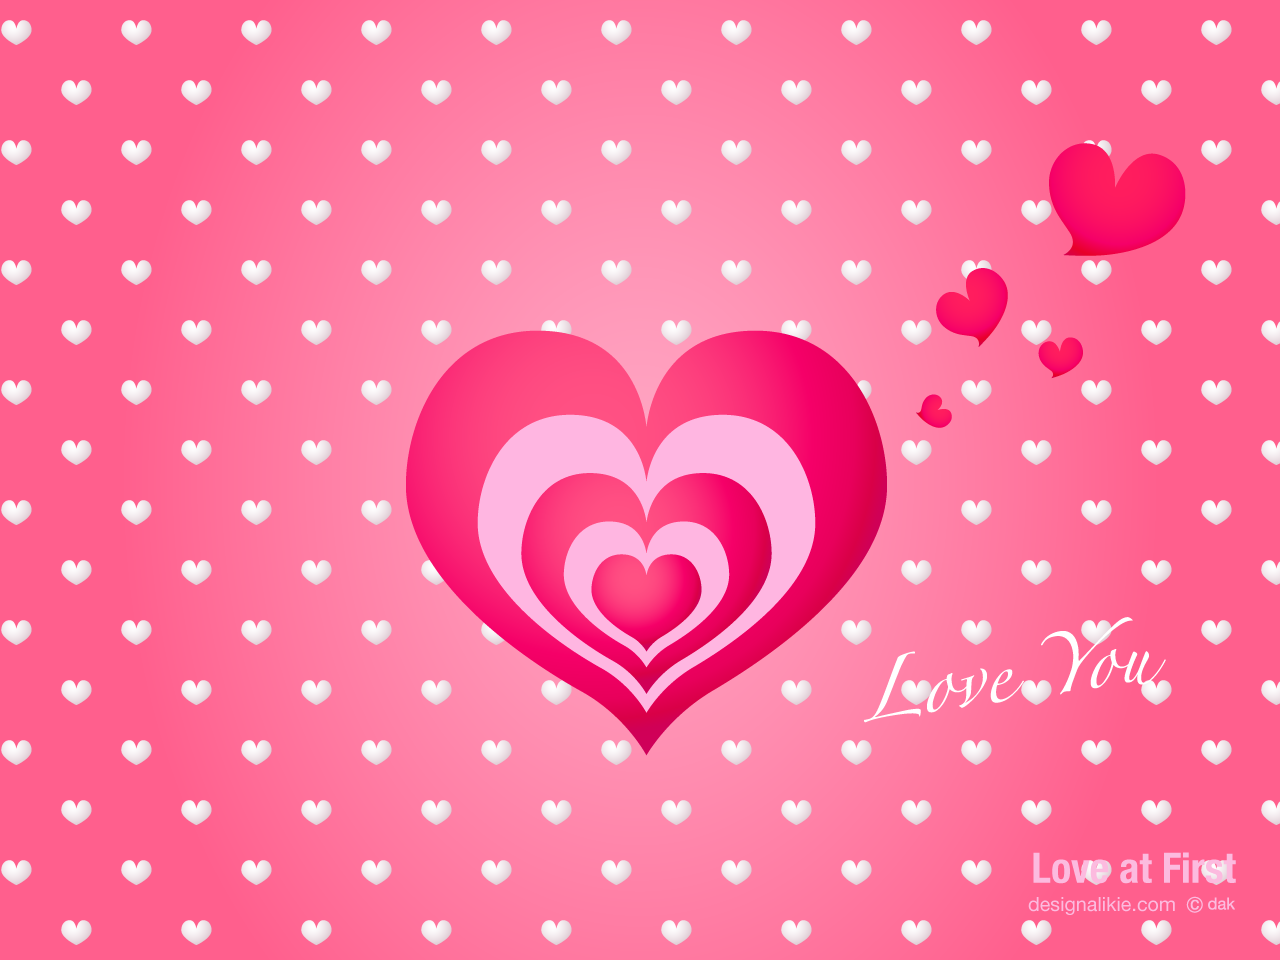 Free Download Cute Heart Mark Wallpaper Desktop Wallpaper